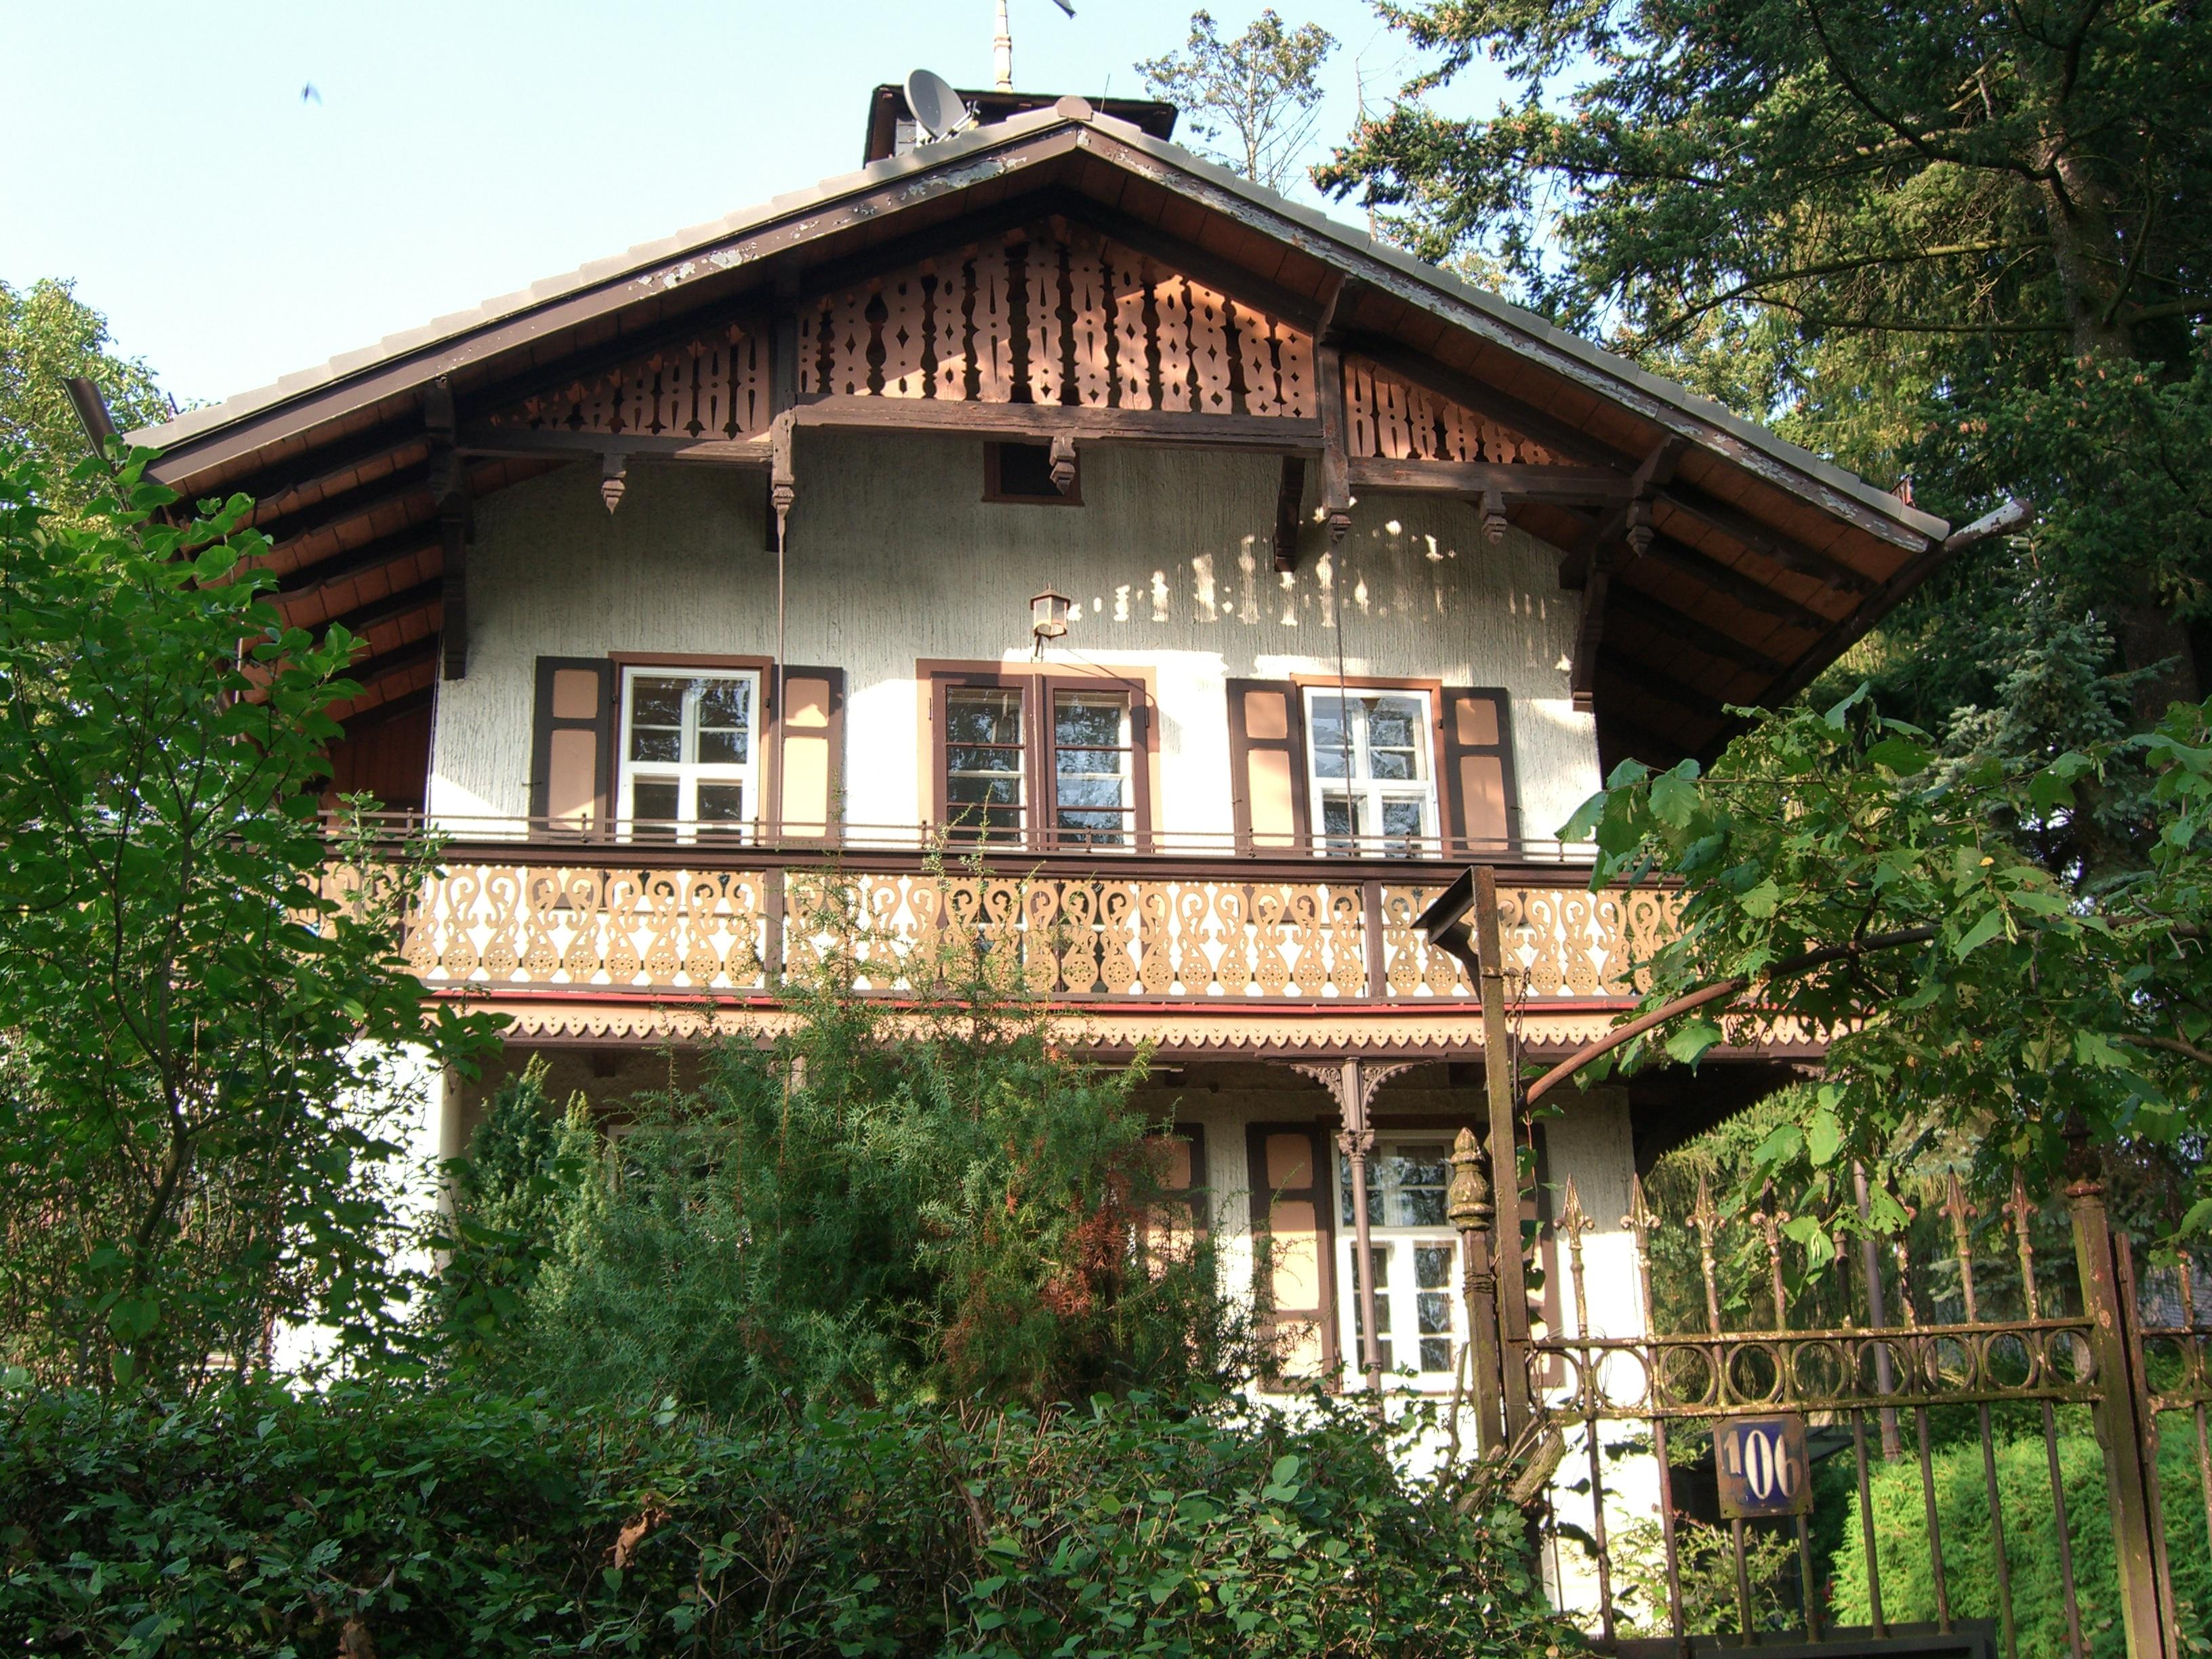 File:ER-Burgberg-old-villa.jpg - Wikimedia Commons